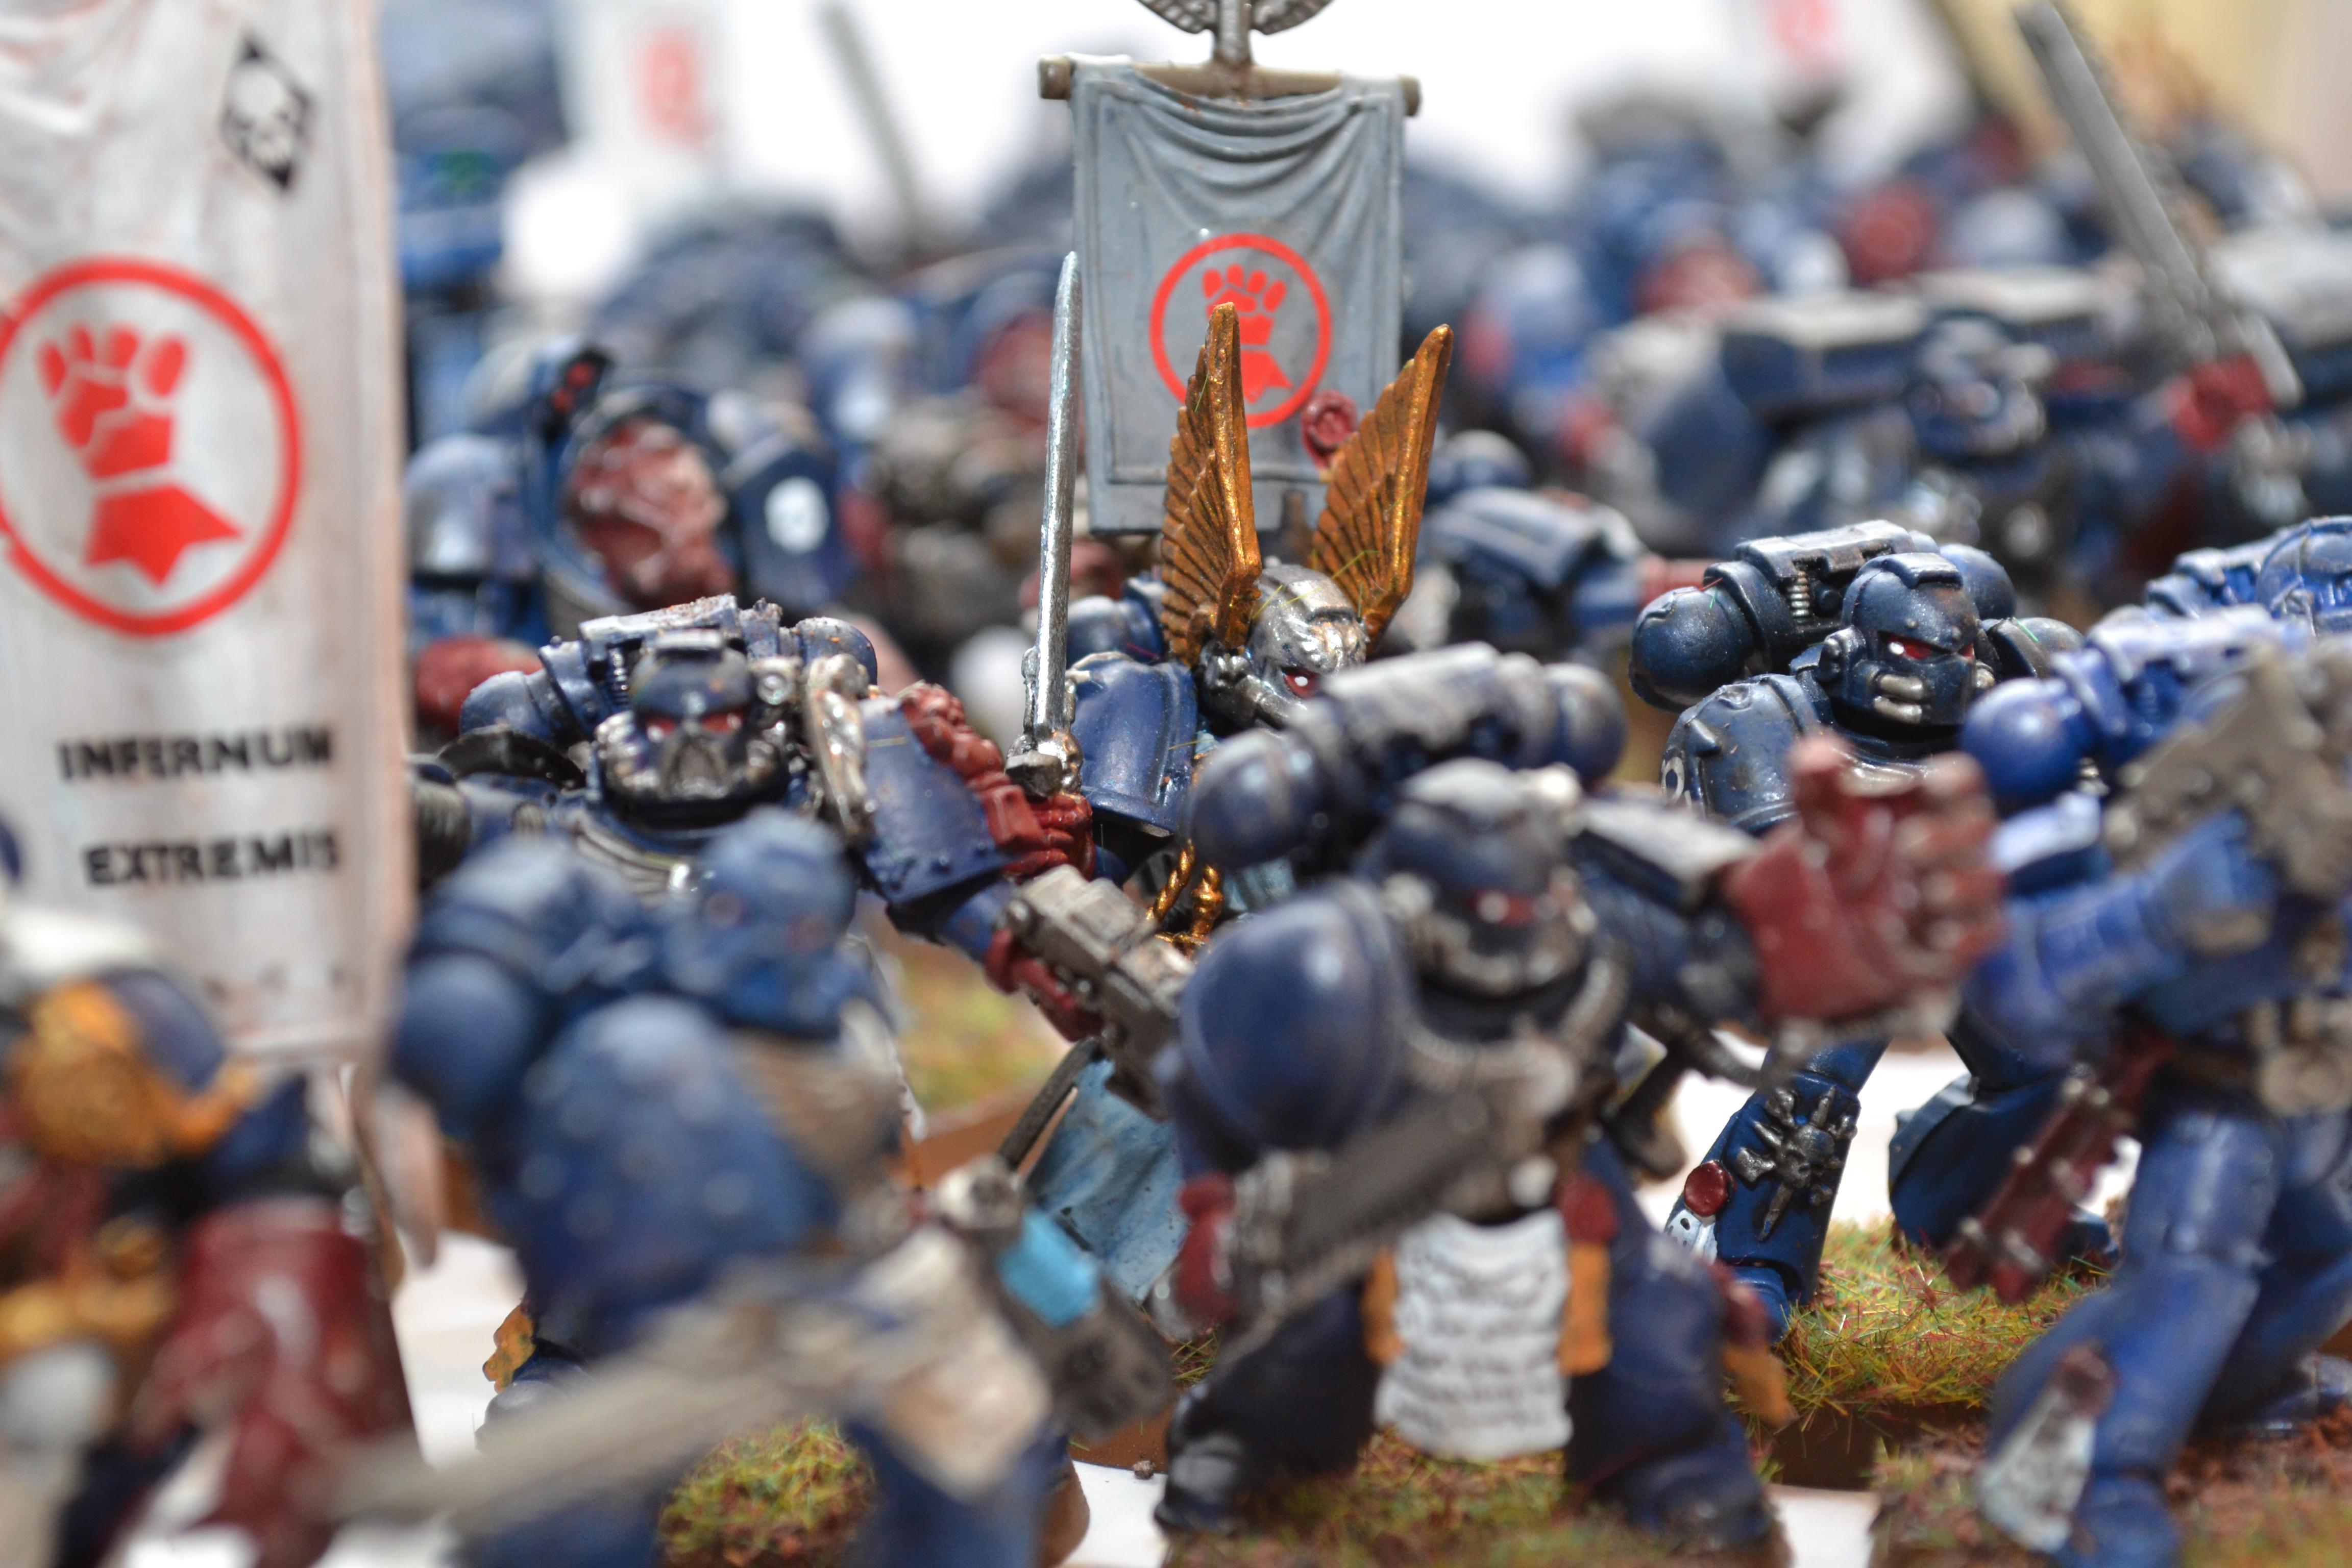 Crimson Fists, Forward the Champion